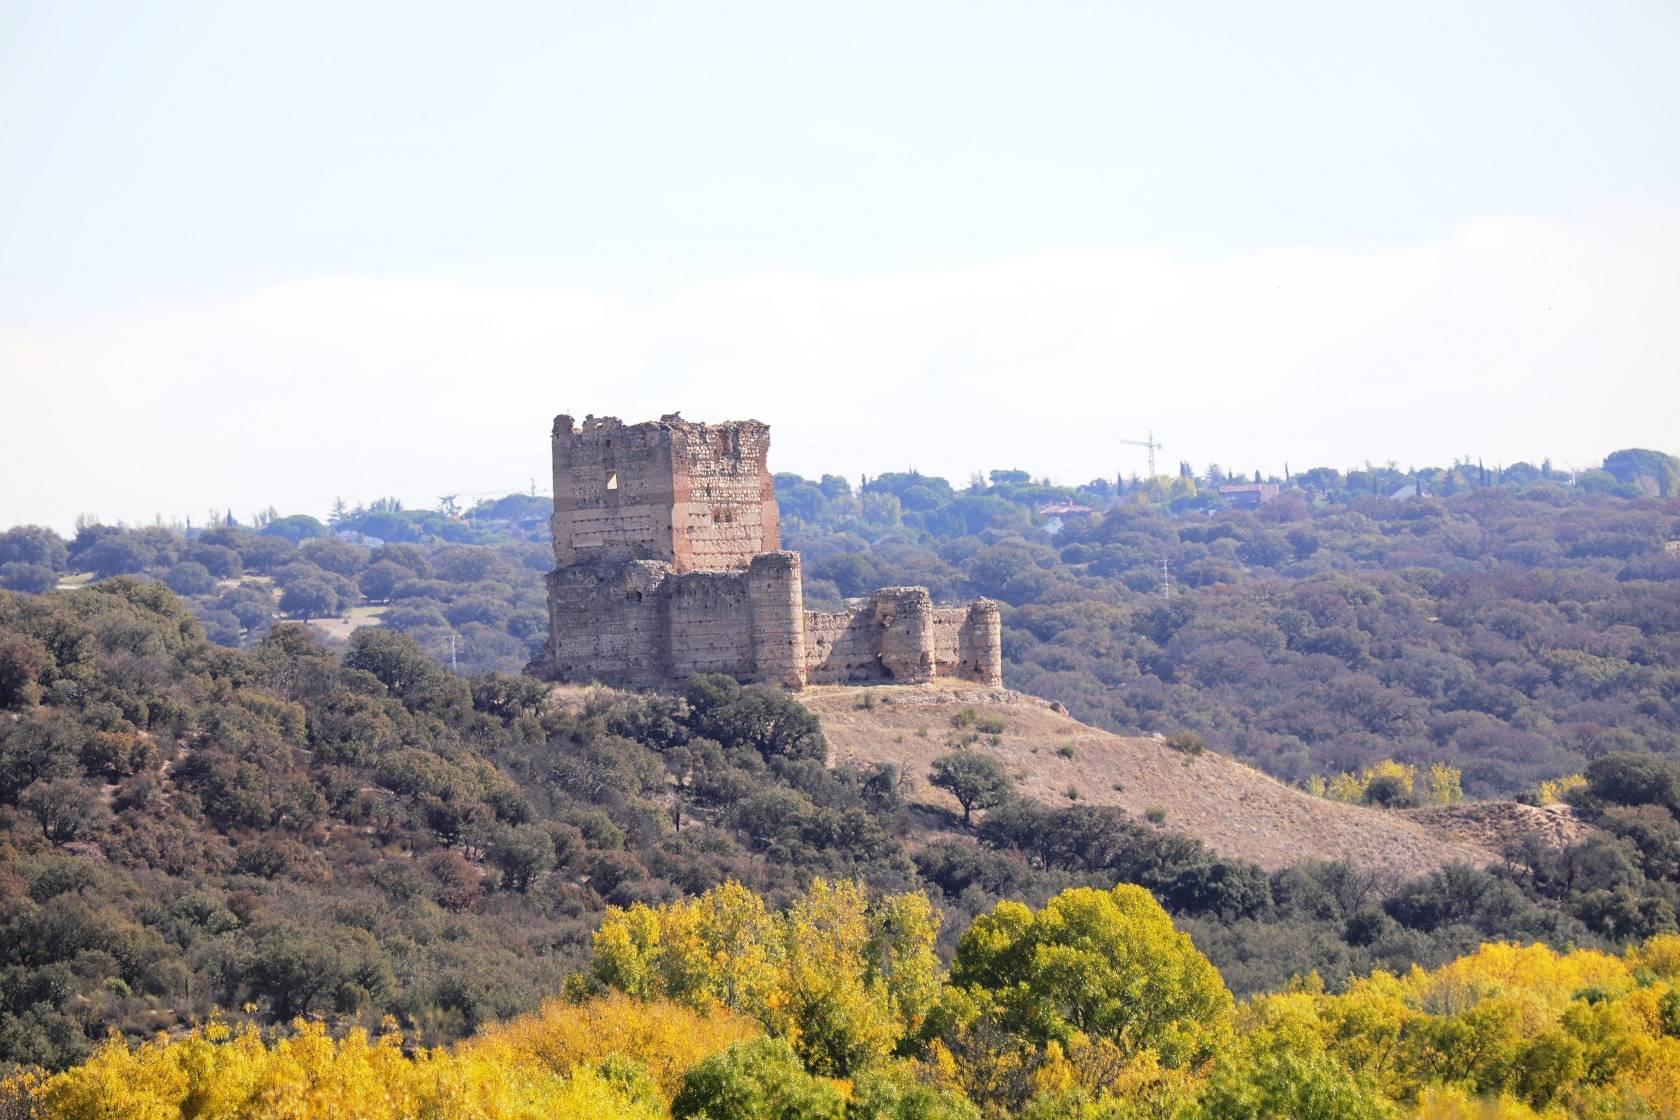 Imagen del Castillo de Aulencia, rodeado de la flora autóctona.